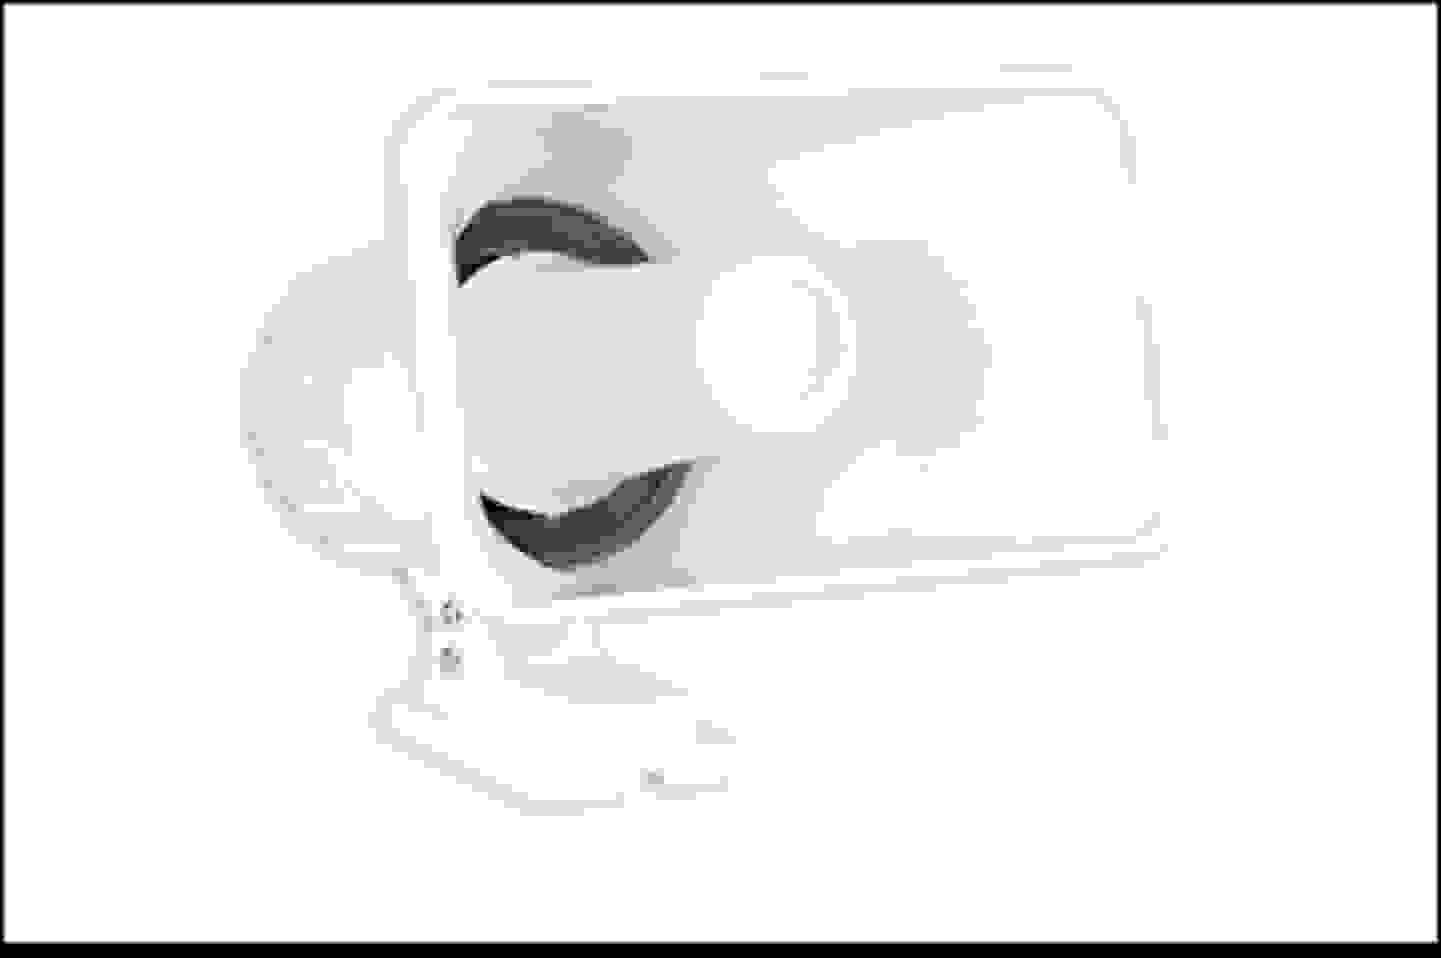 Speaka Professional - Druckkammer-Lautsprecher